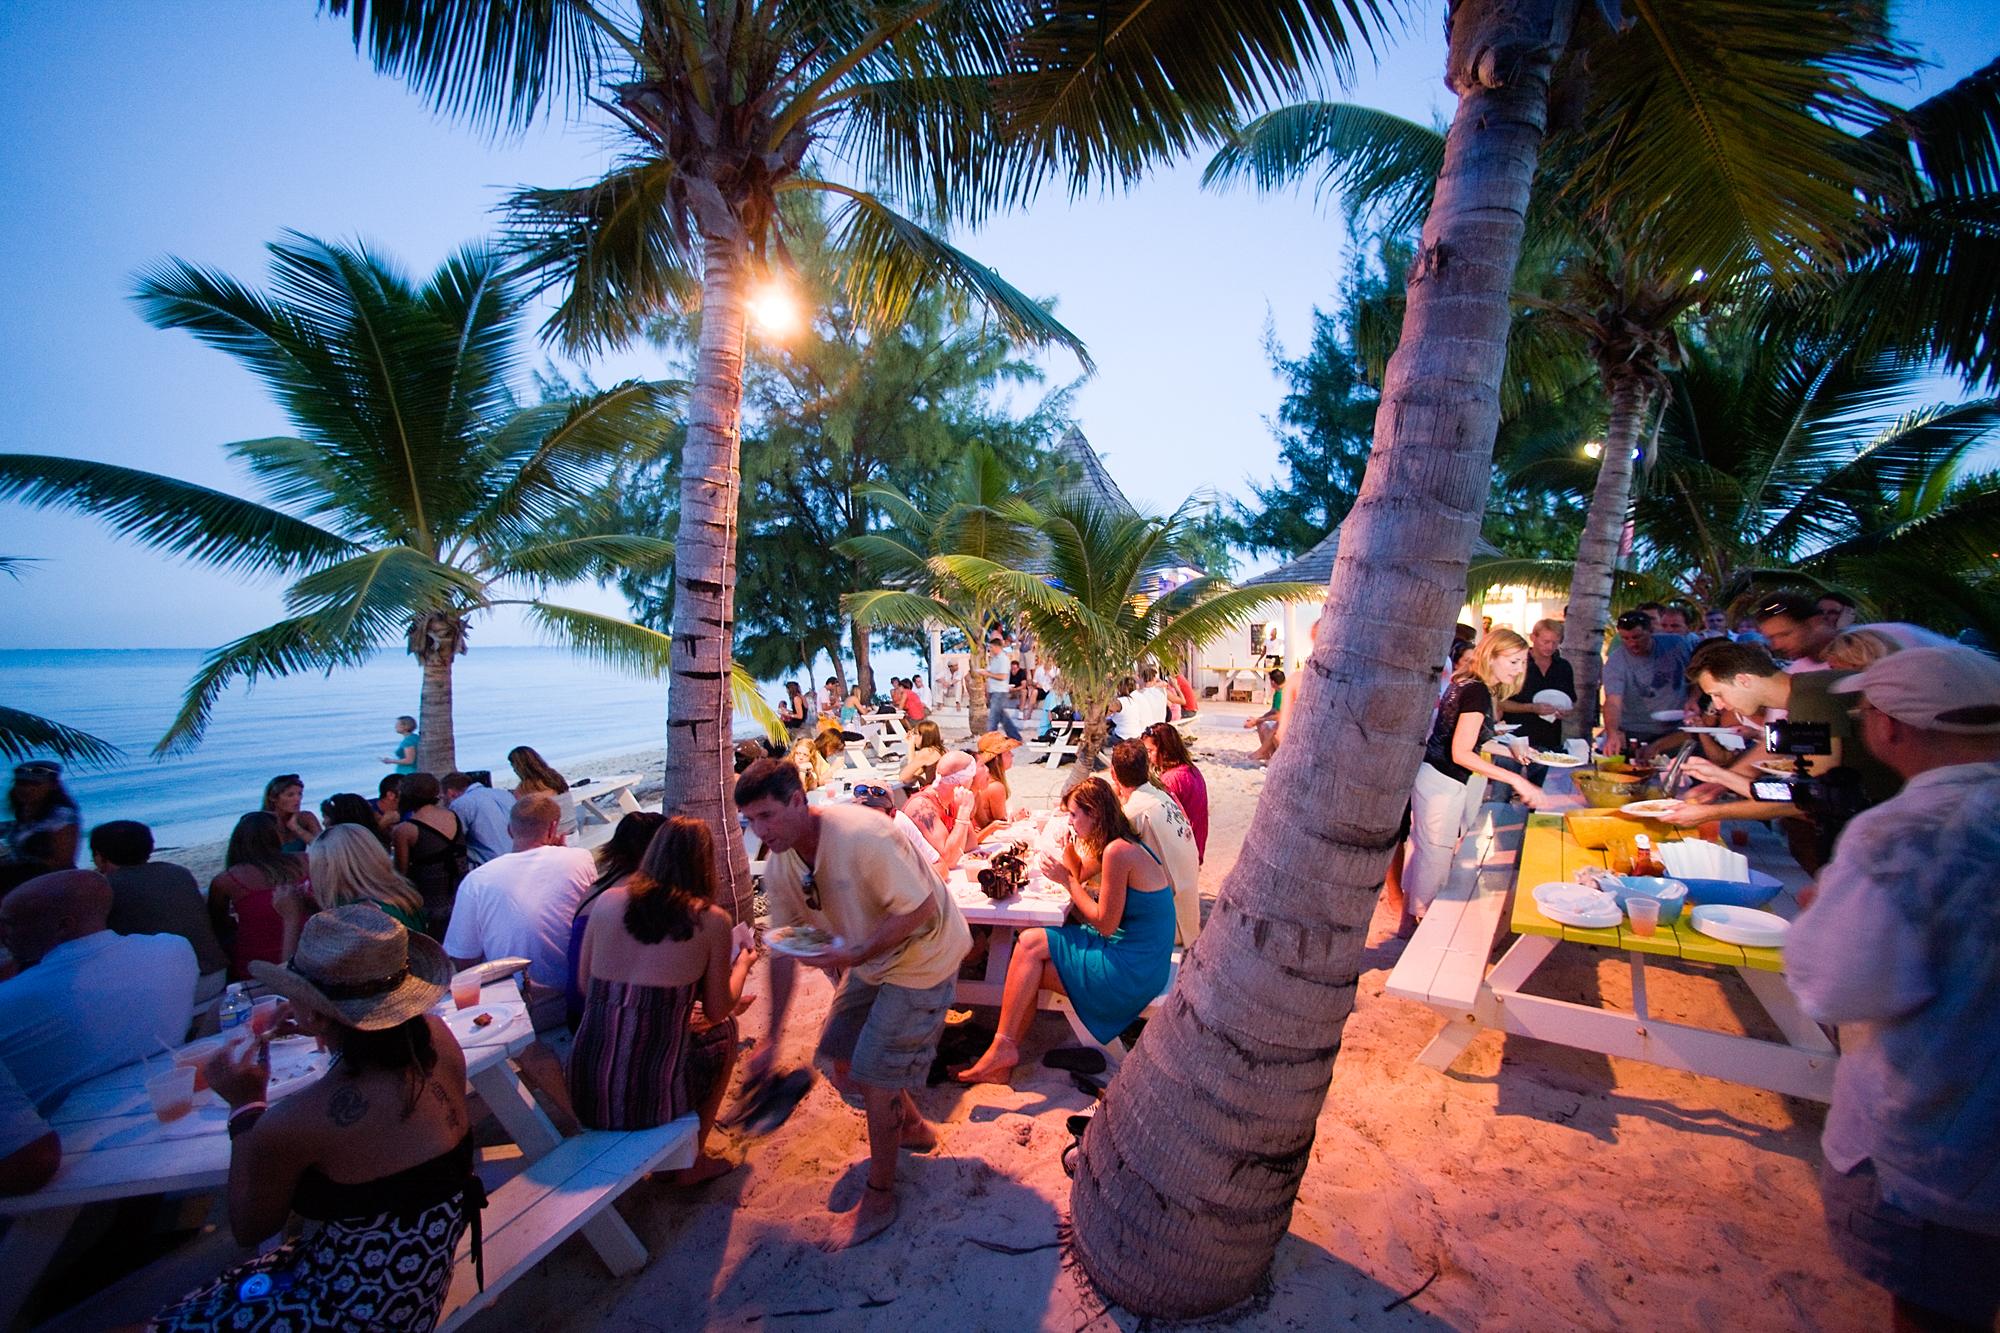 Turks & Caicos visitors enjoy conch at Da Shack. Martin A Lingnau, Mermaid Pictures